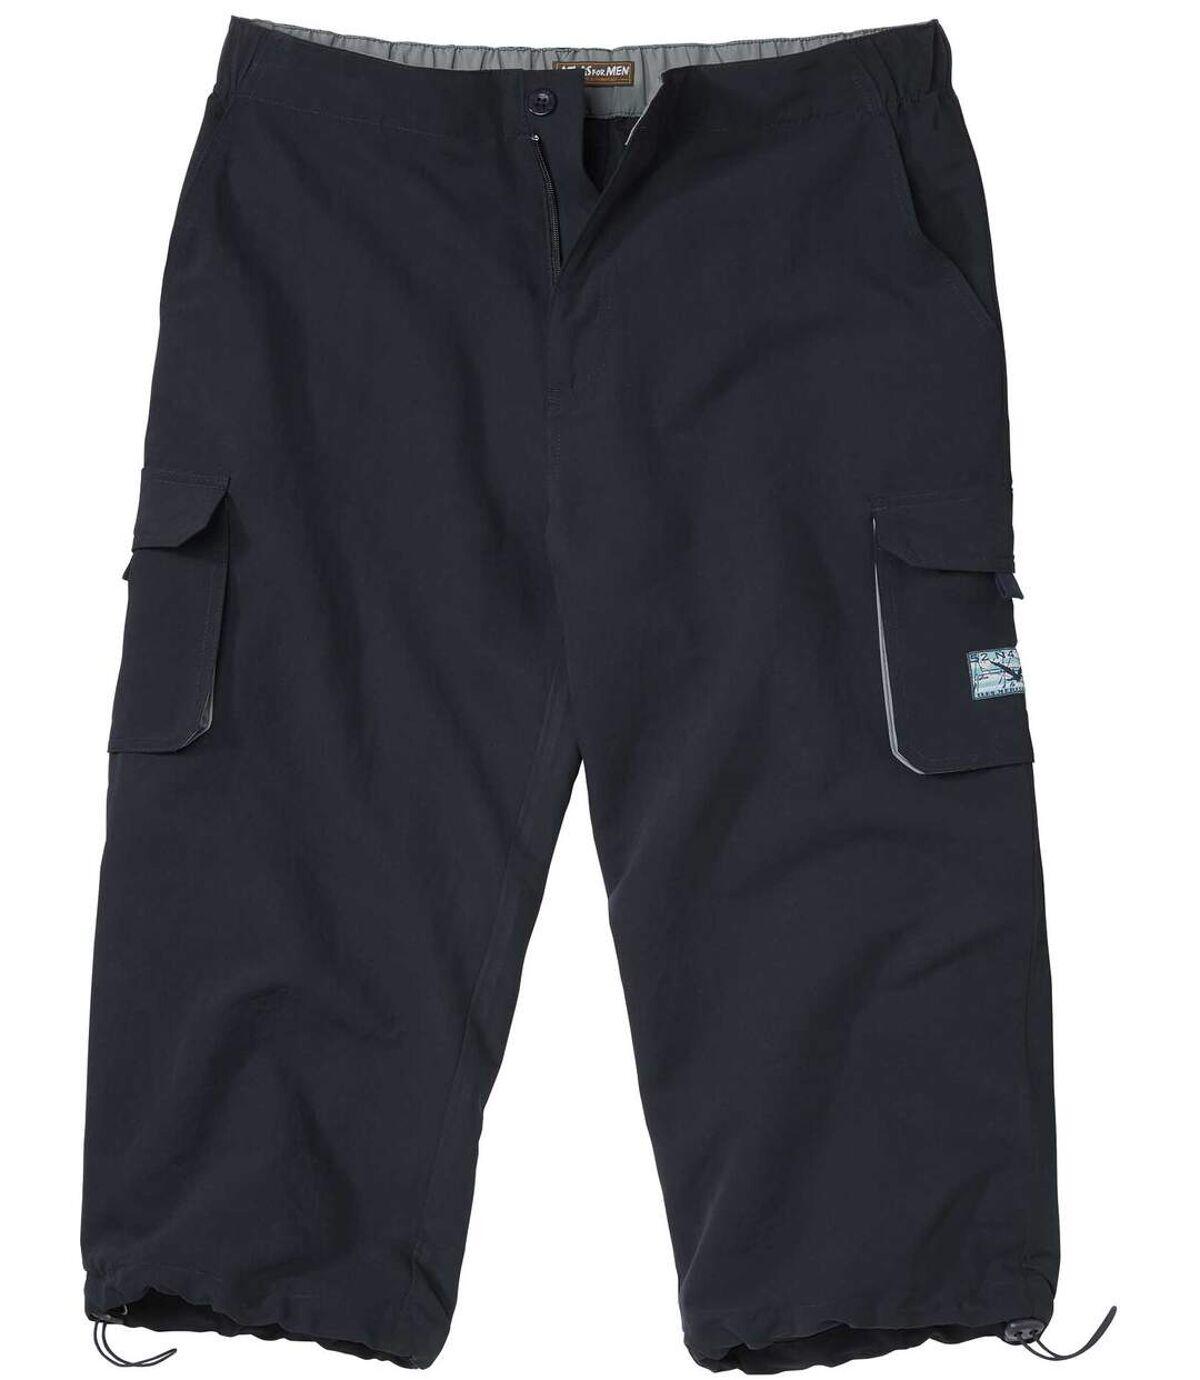 Spodnie 3/4 z mikrofibry Atlas For Men